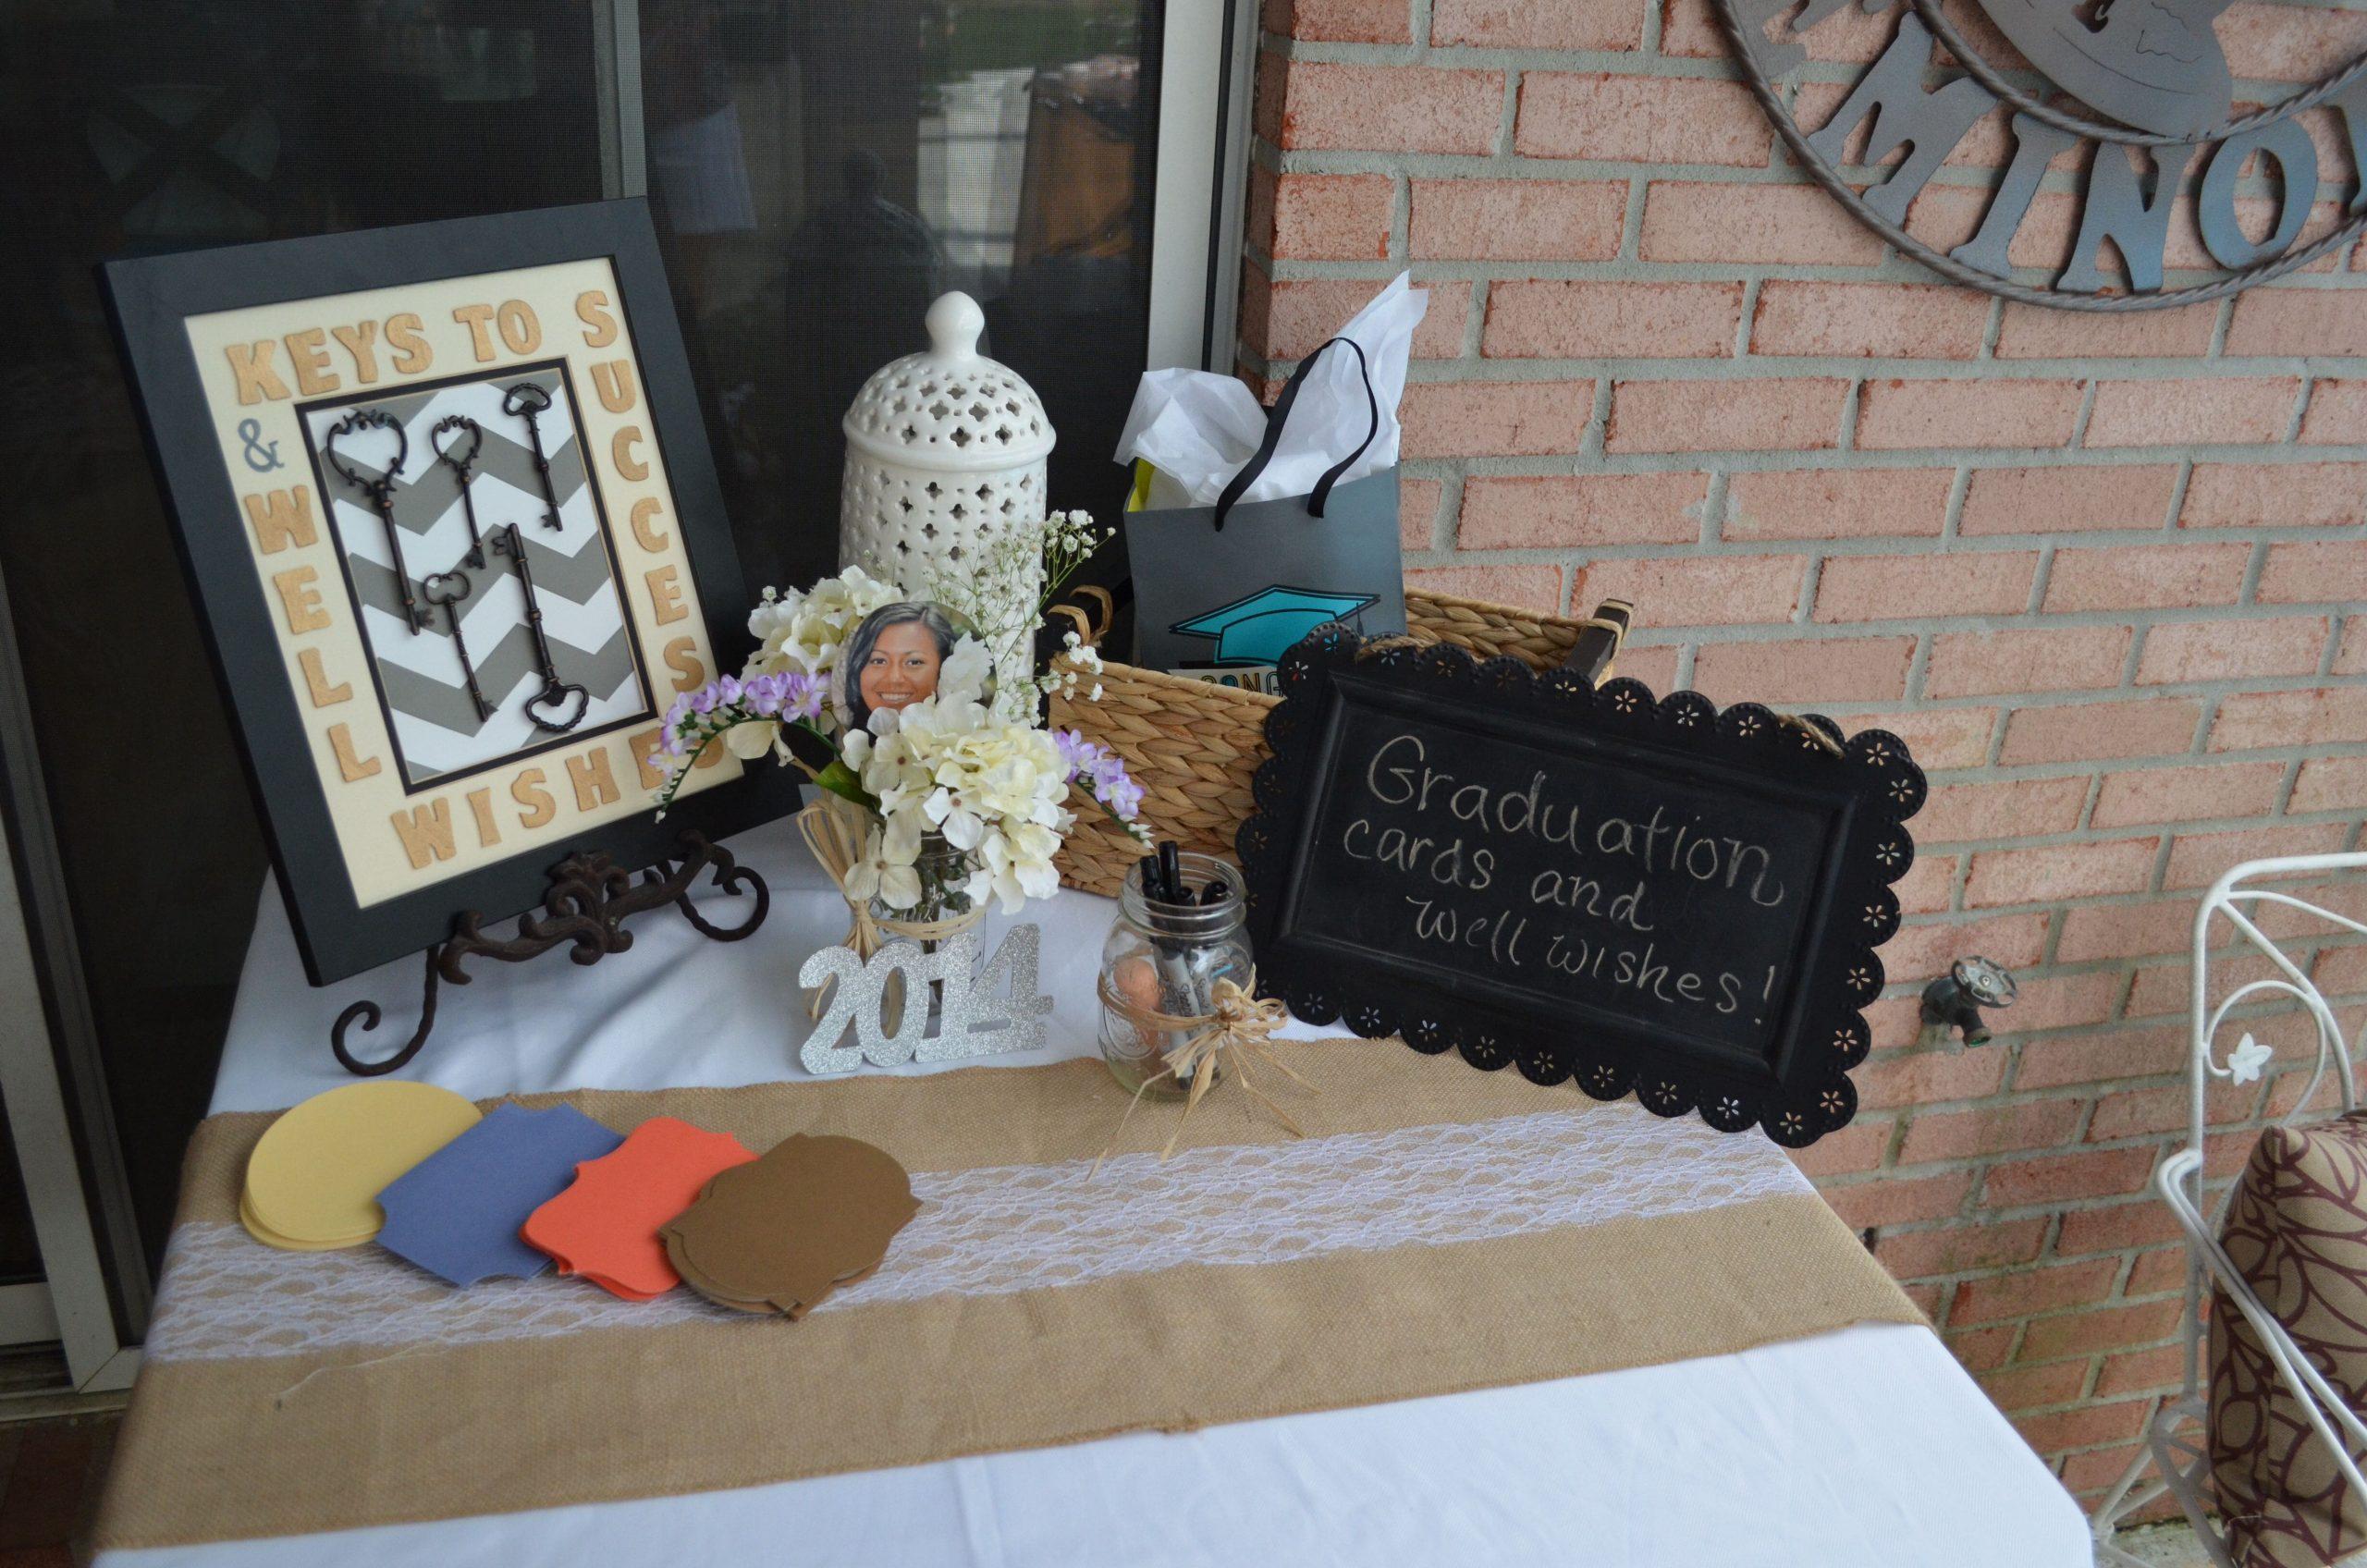 1.Simphome.com Provide a Gift Table